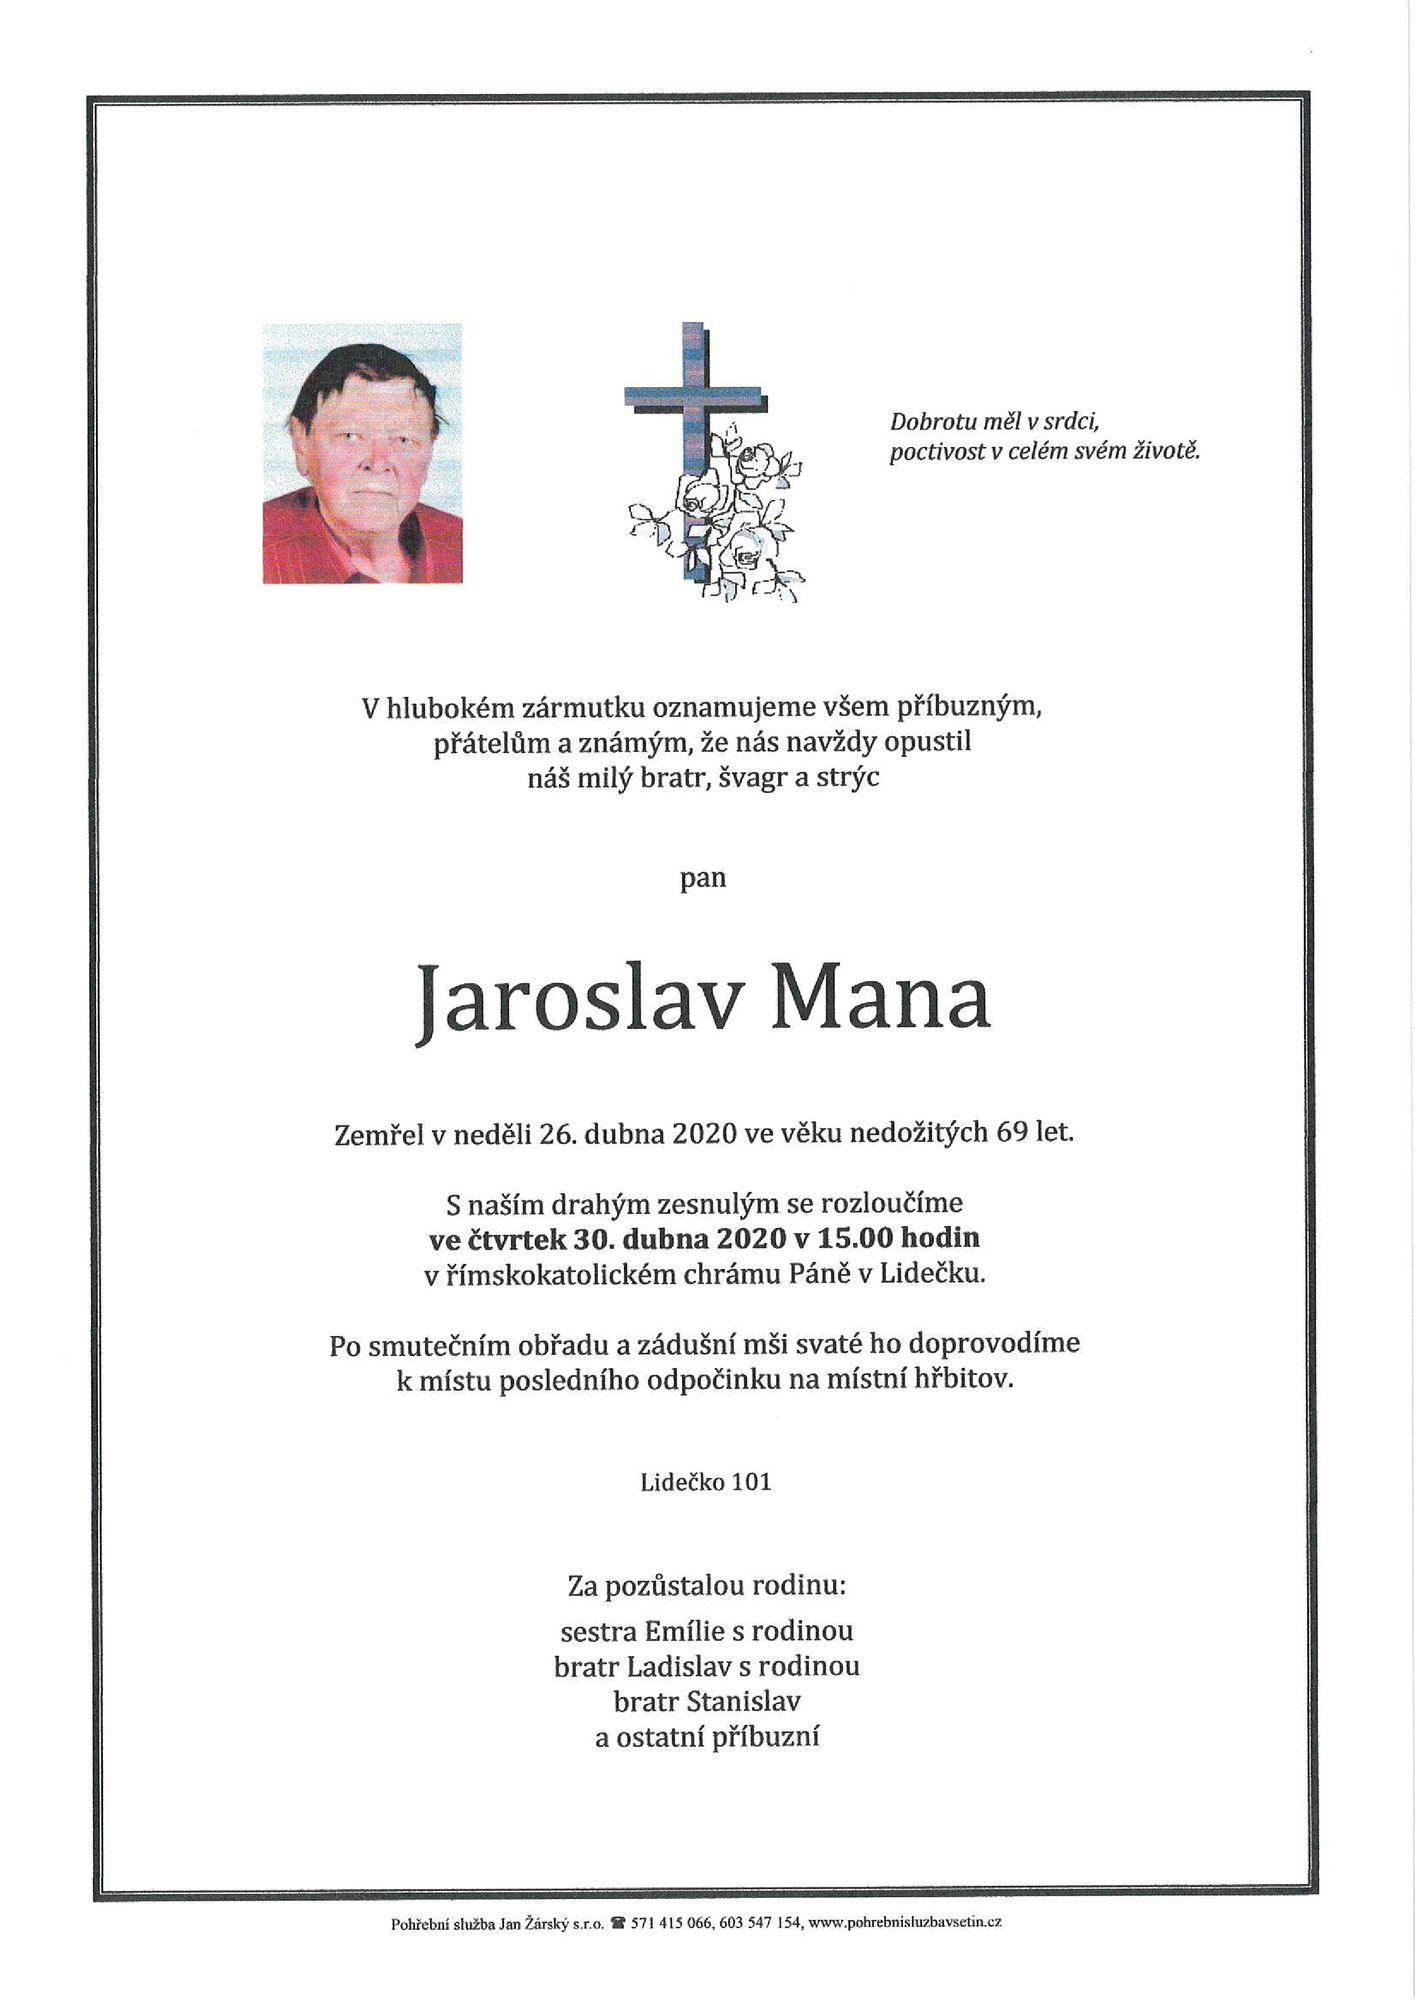 Jaroslav Mana